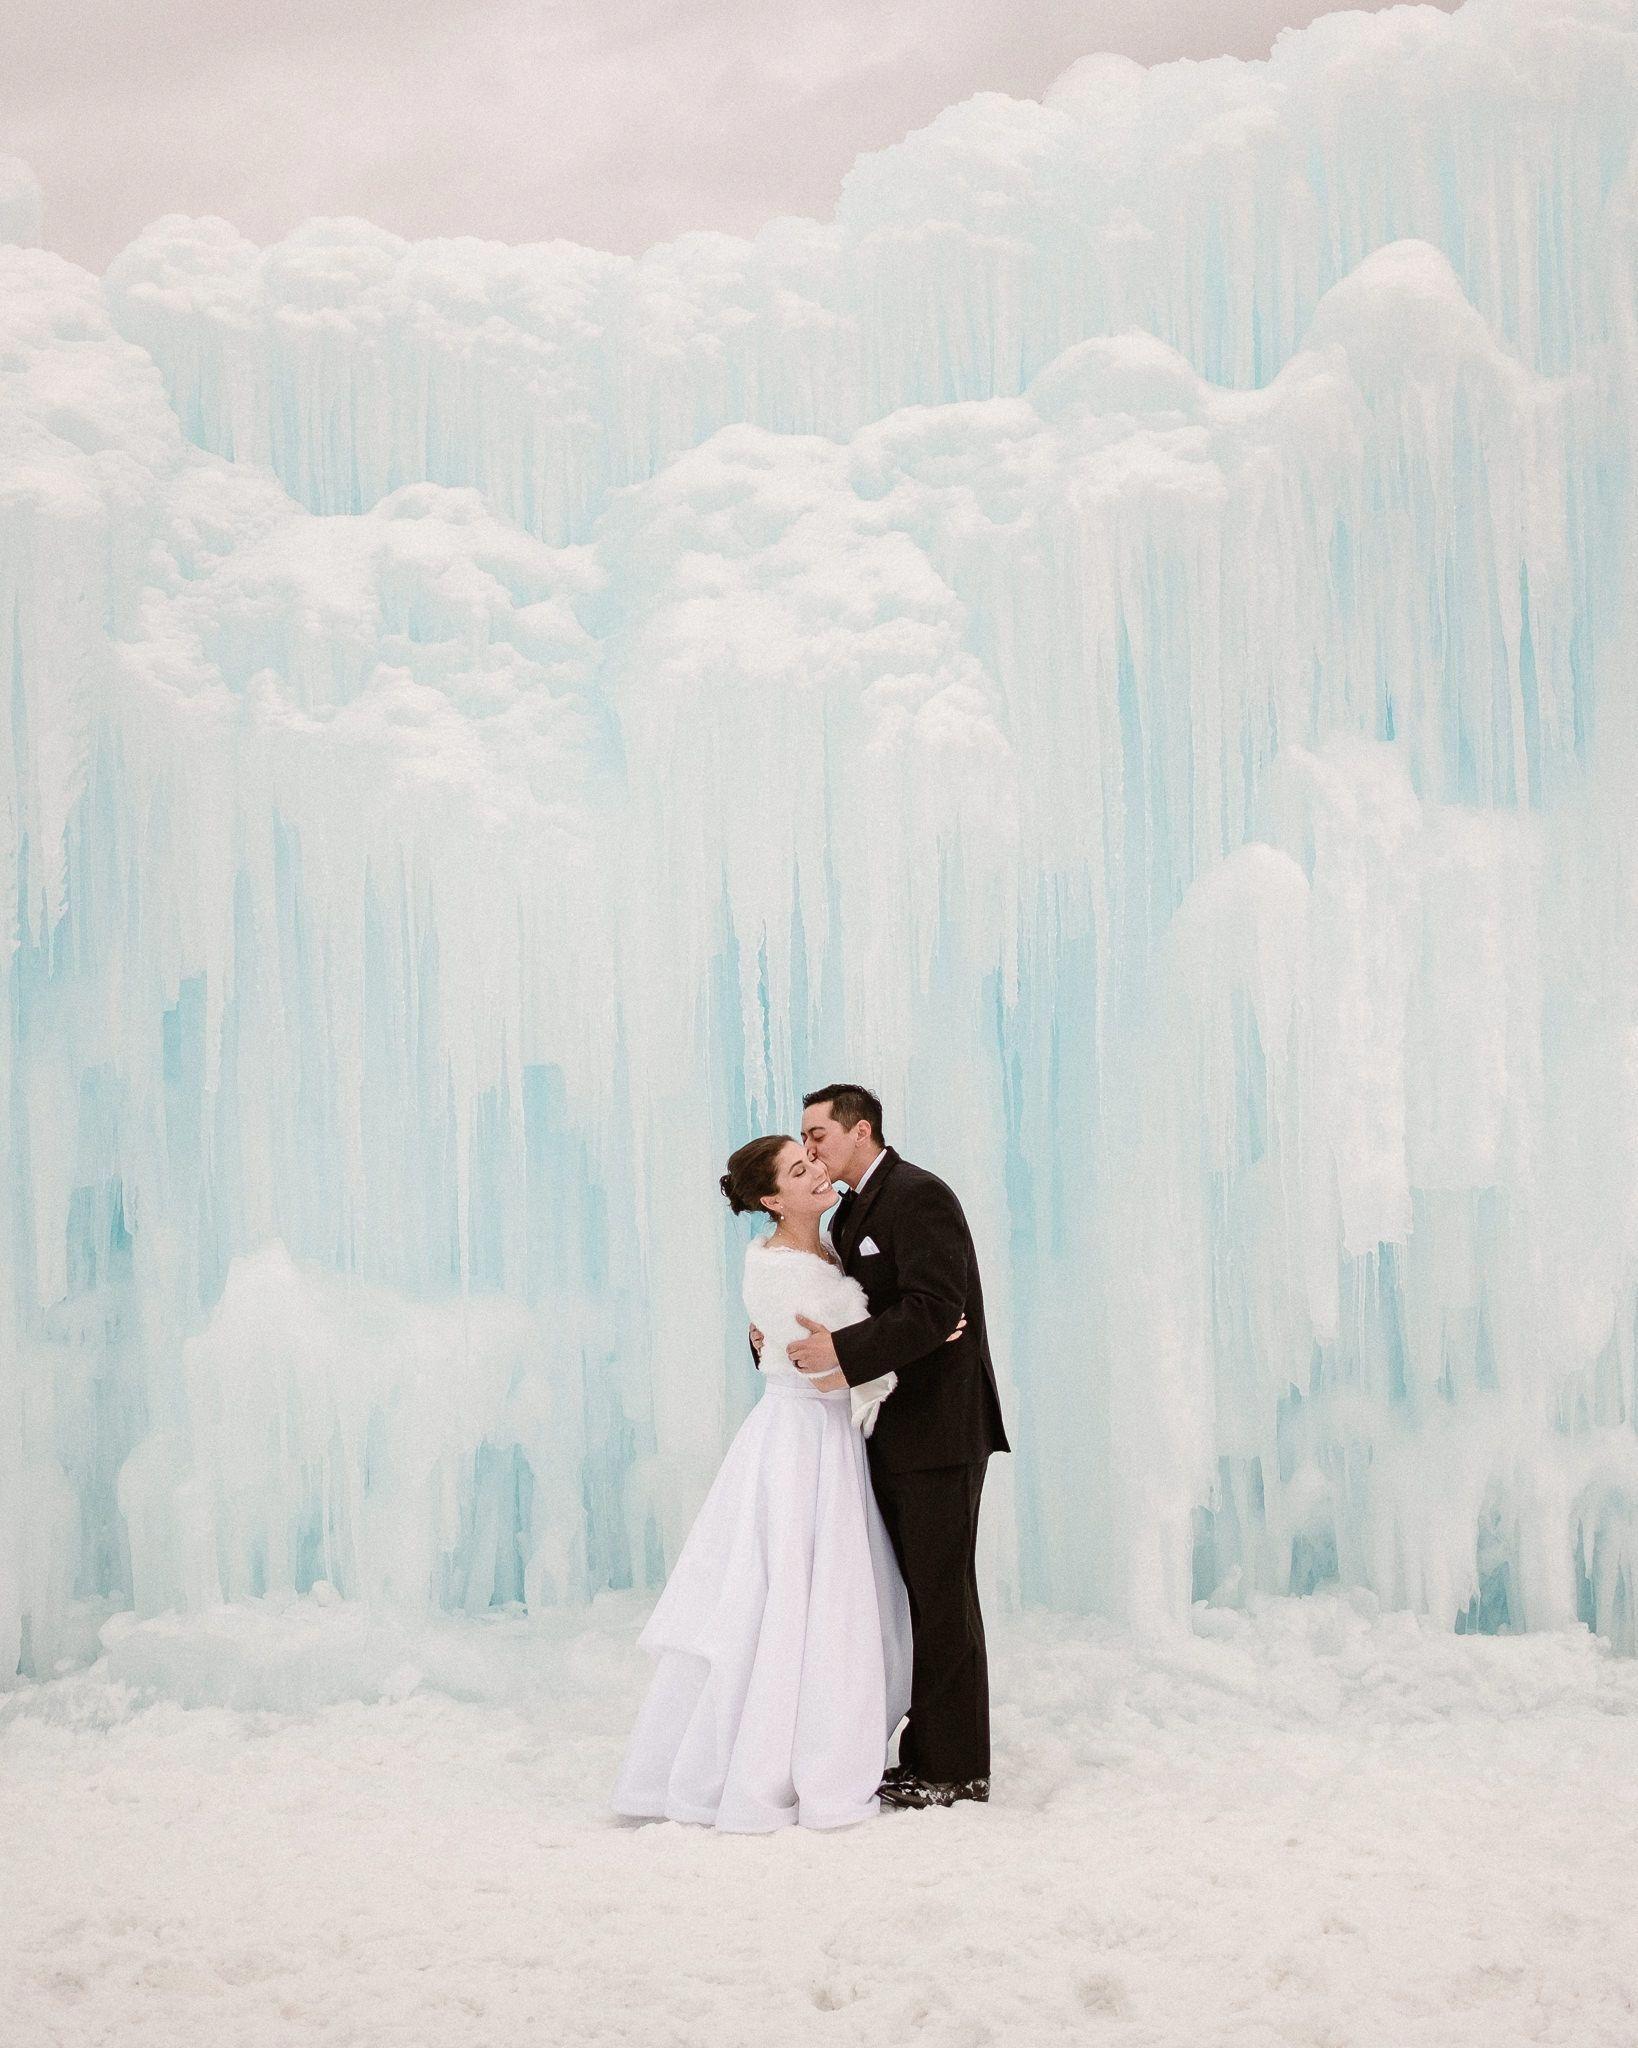 Four Fantastic Winter Wedding Reception Ideas   Winter ...